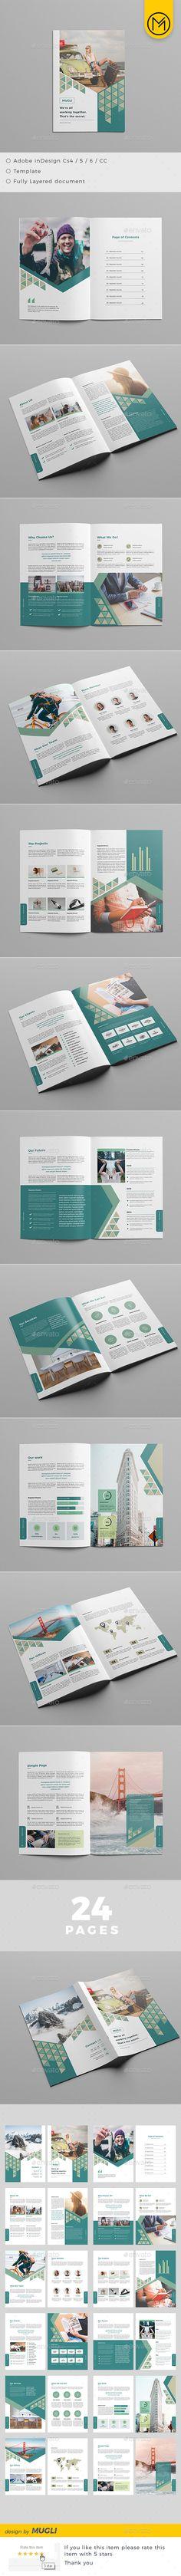 Brochure — InDesign INDD #template #marketing • Download ➝ https://graphicriver.net/item/brochure/19210751?ref=pxcr